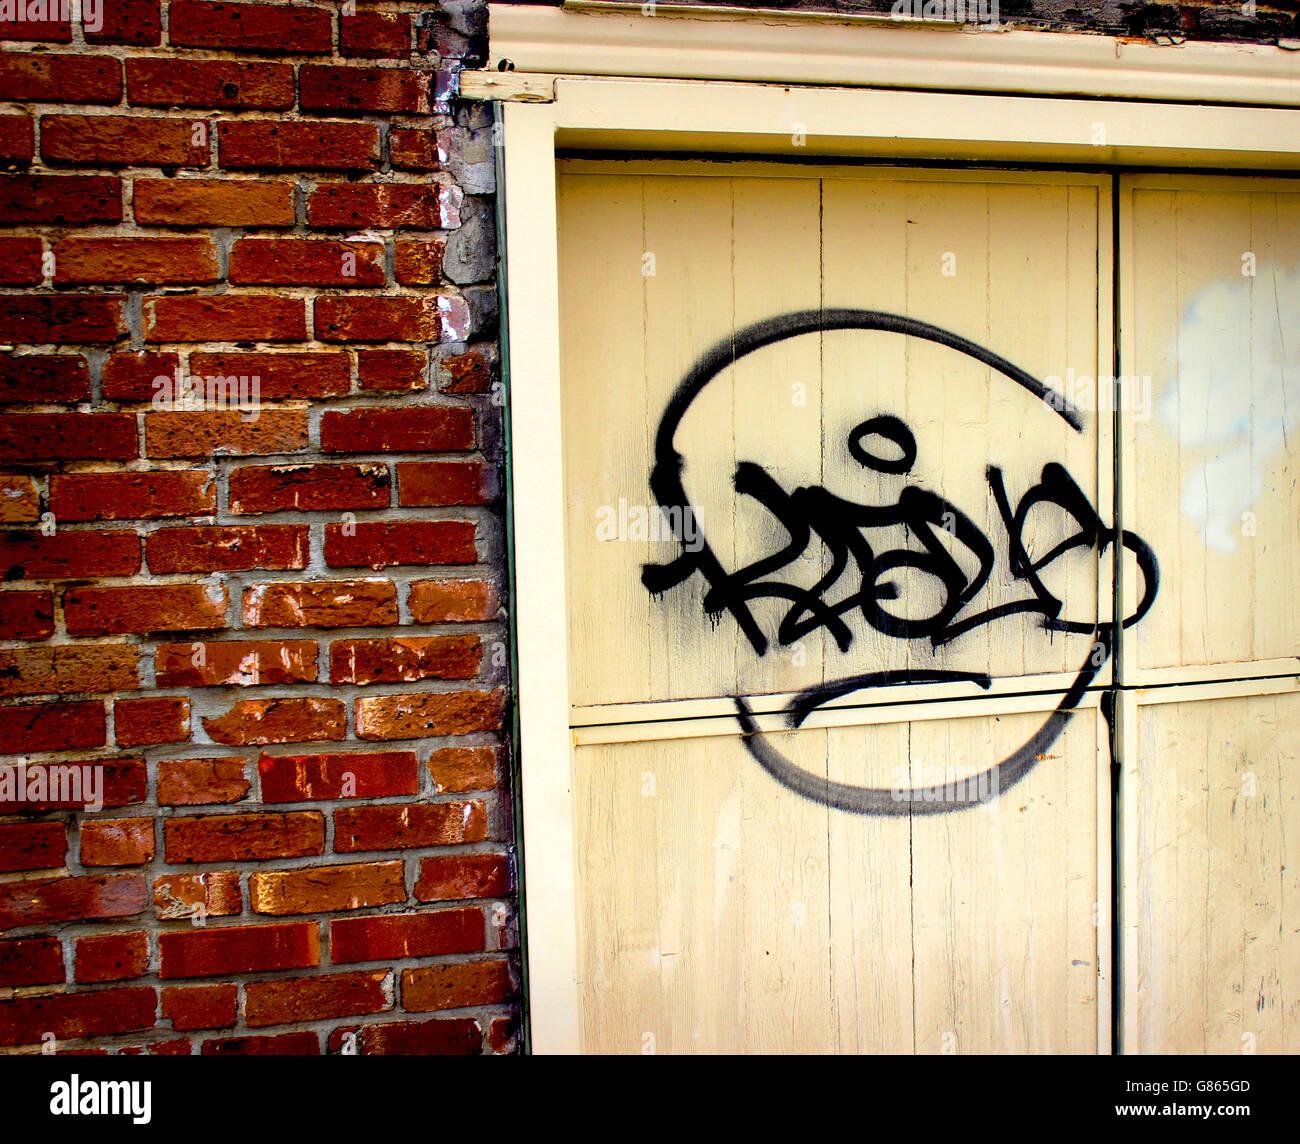 A door, a wall, and Graffiti - Stock Image